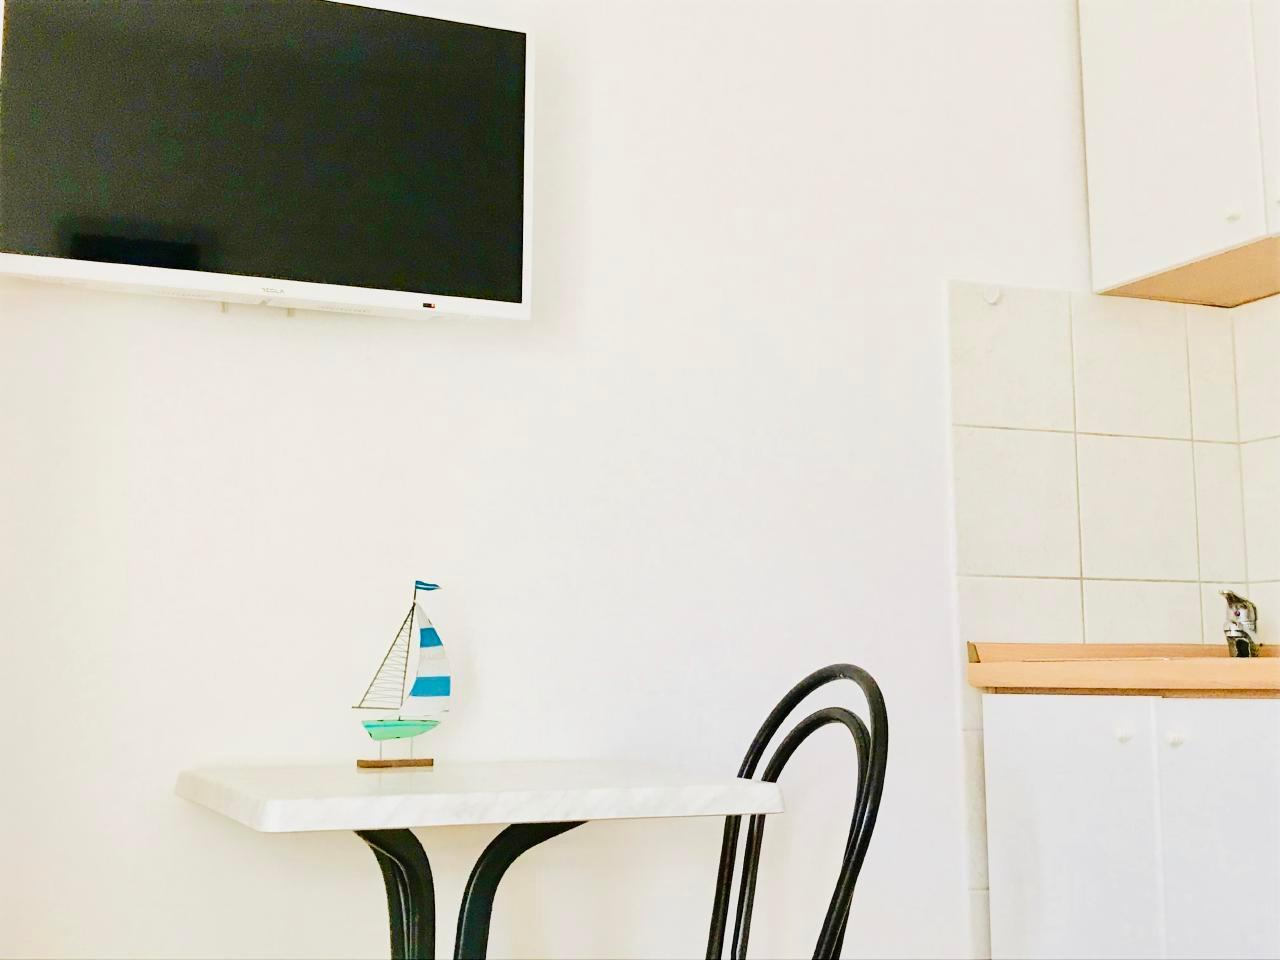 Ferienwohnung Apartmenthaus Ruza 4 - Studio (98392), Kaštel Štafilić, , Dalmatien, Kroatien, Bild 19